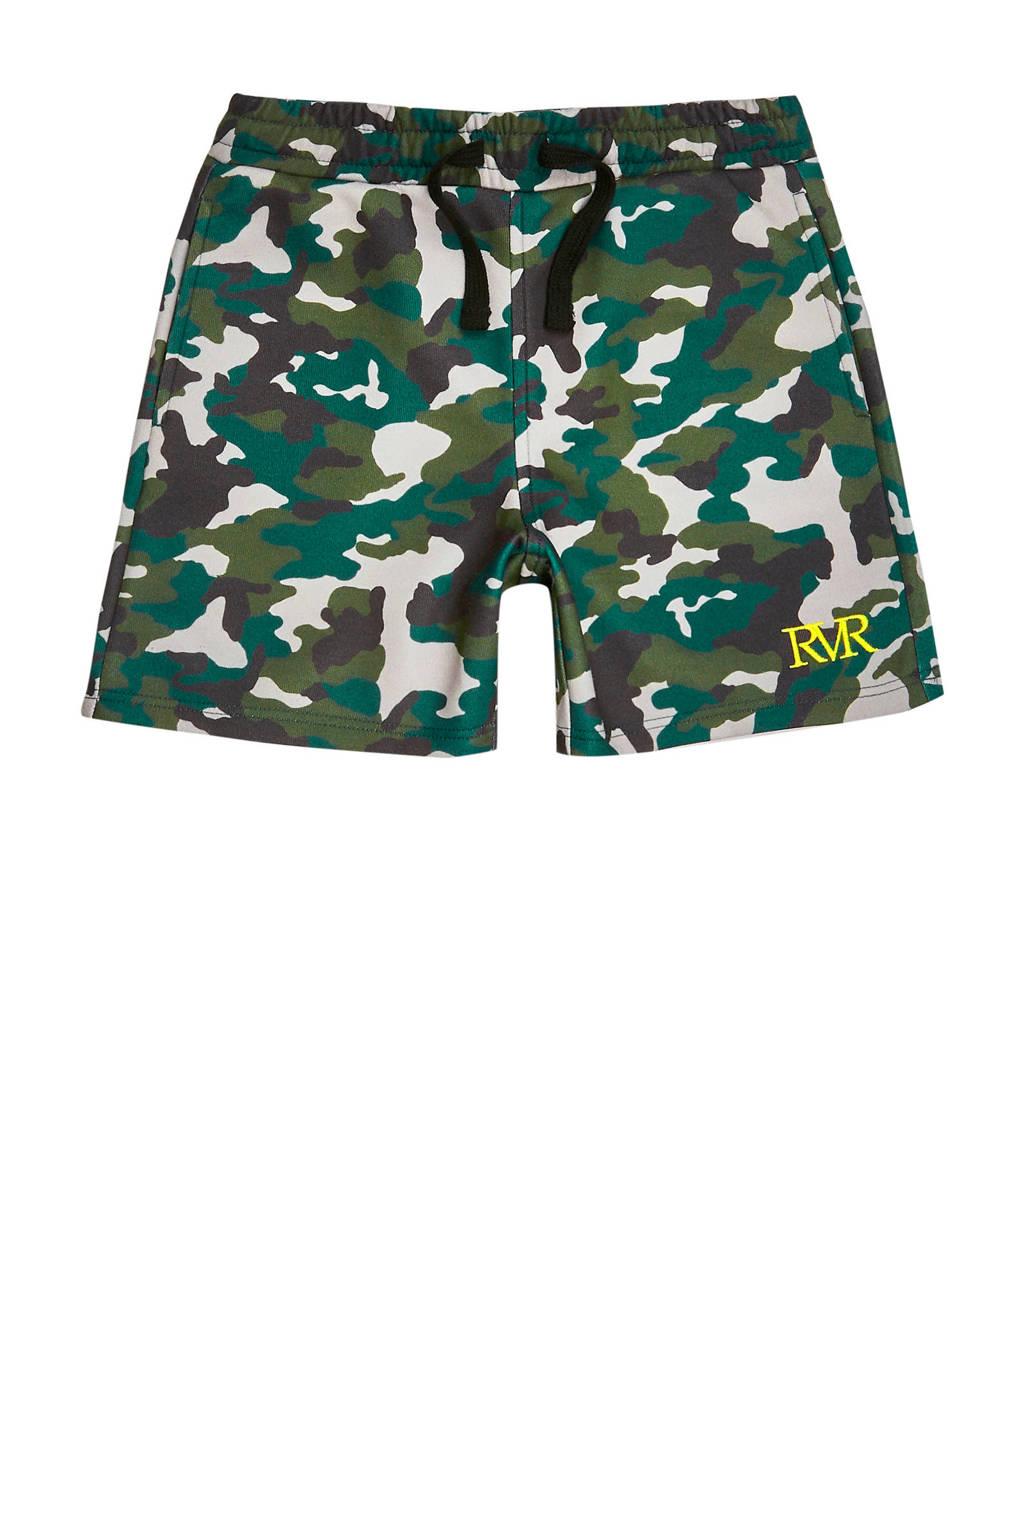 River Island sweatshort met camouflageprint groen/kaki/blauw, Groen/kaki/blauw